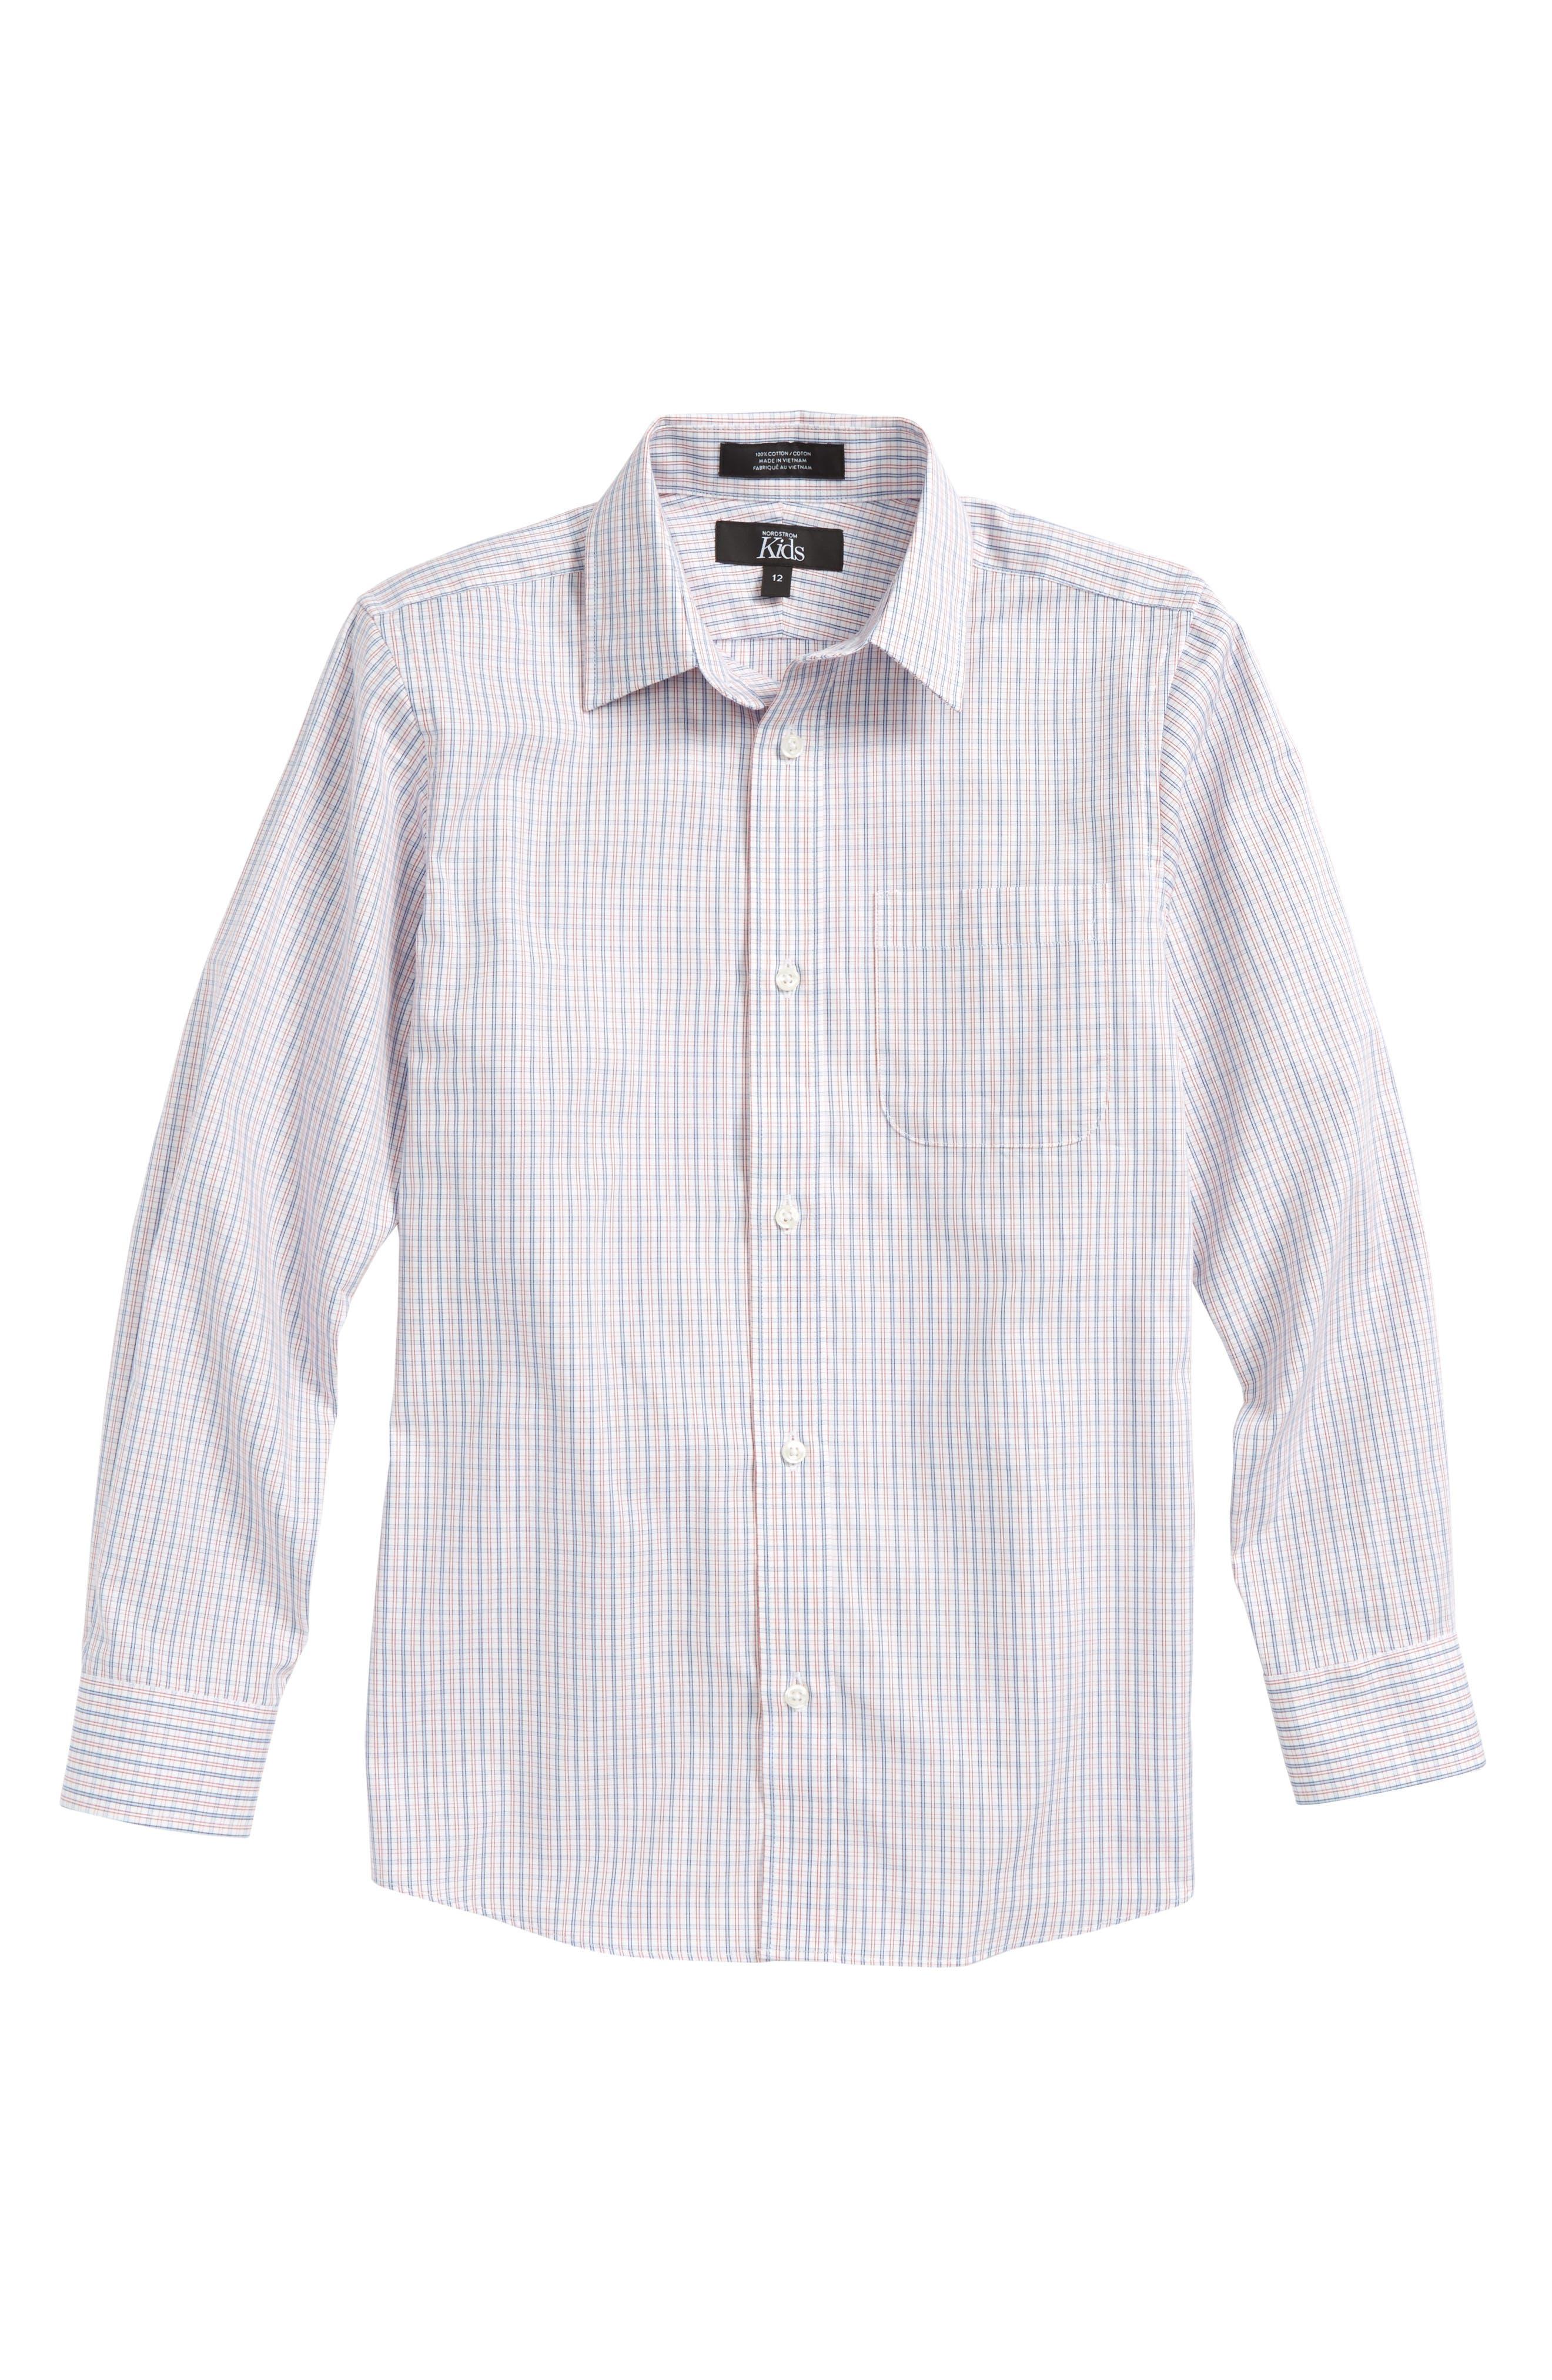 Plaid Dress Shirt,                         Main,                         color, White- Blue Plaid